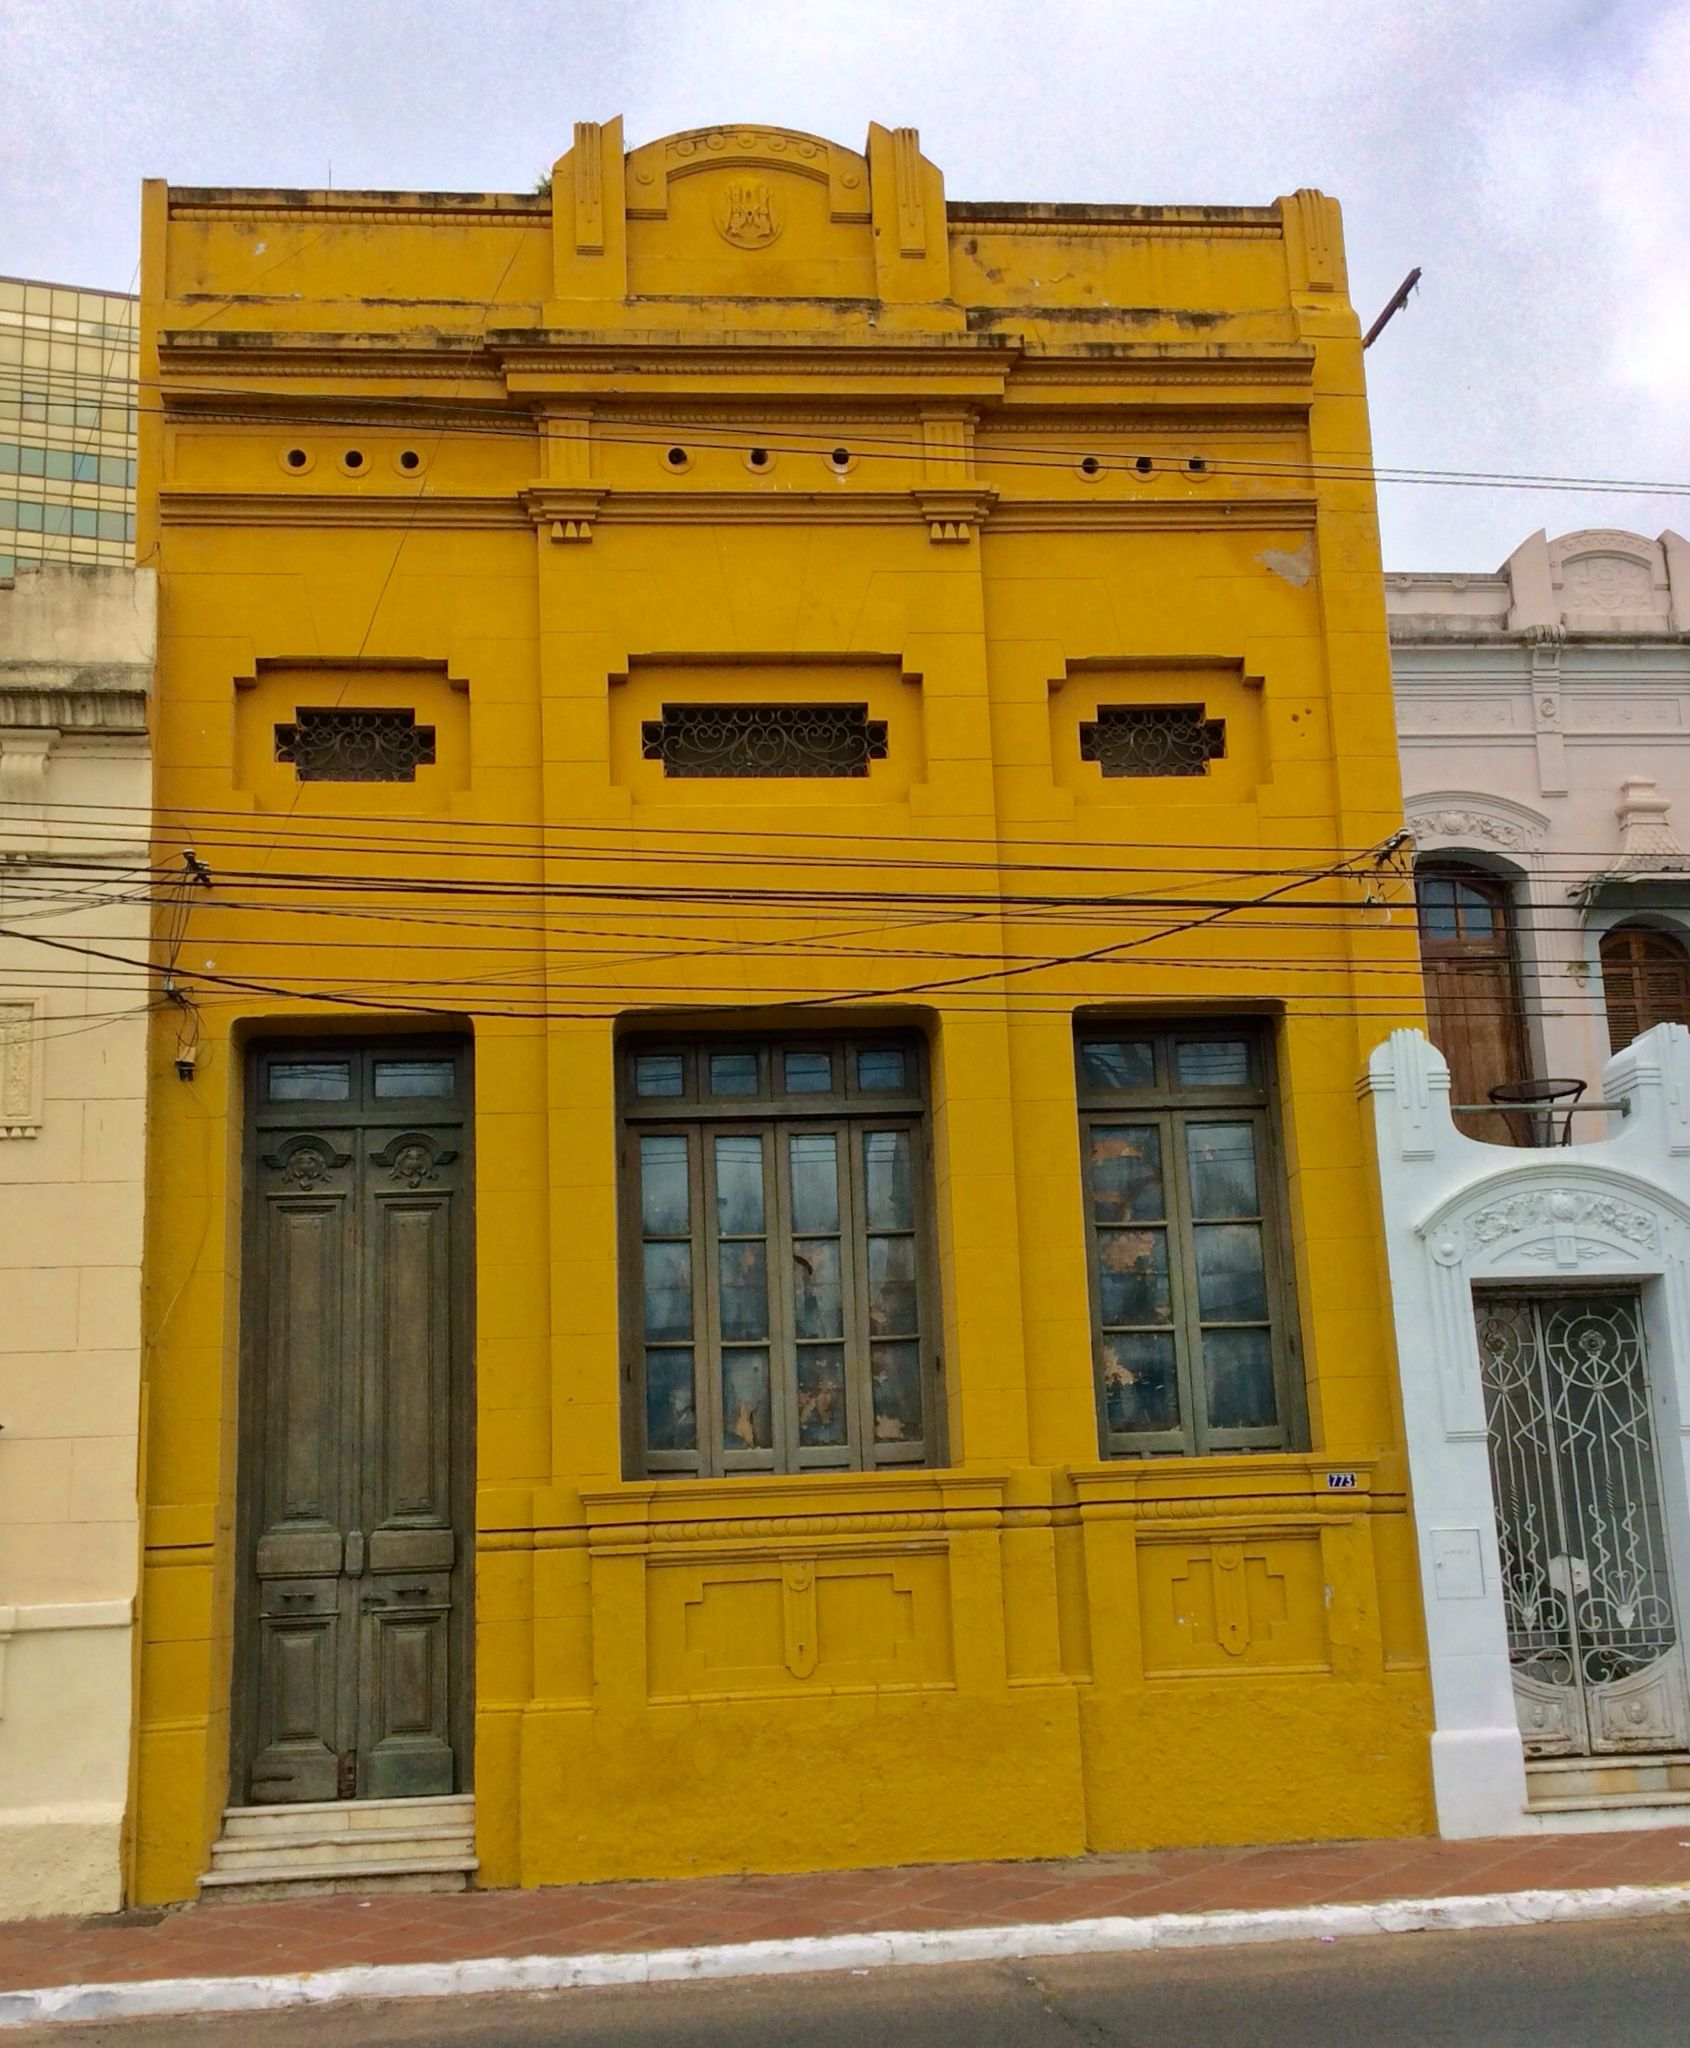 Casa antigua en asunci n paraguay asunci n del paraguay for Puerta casa antigua